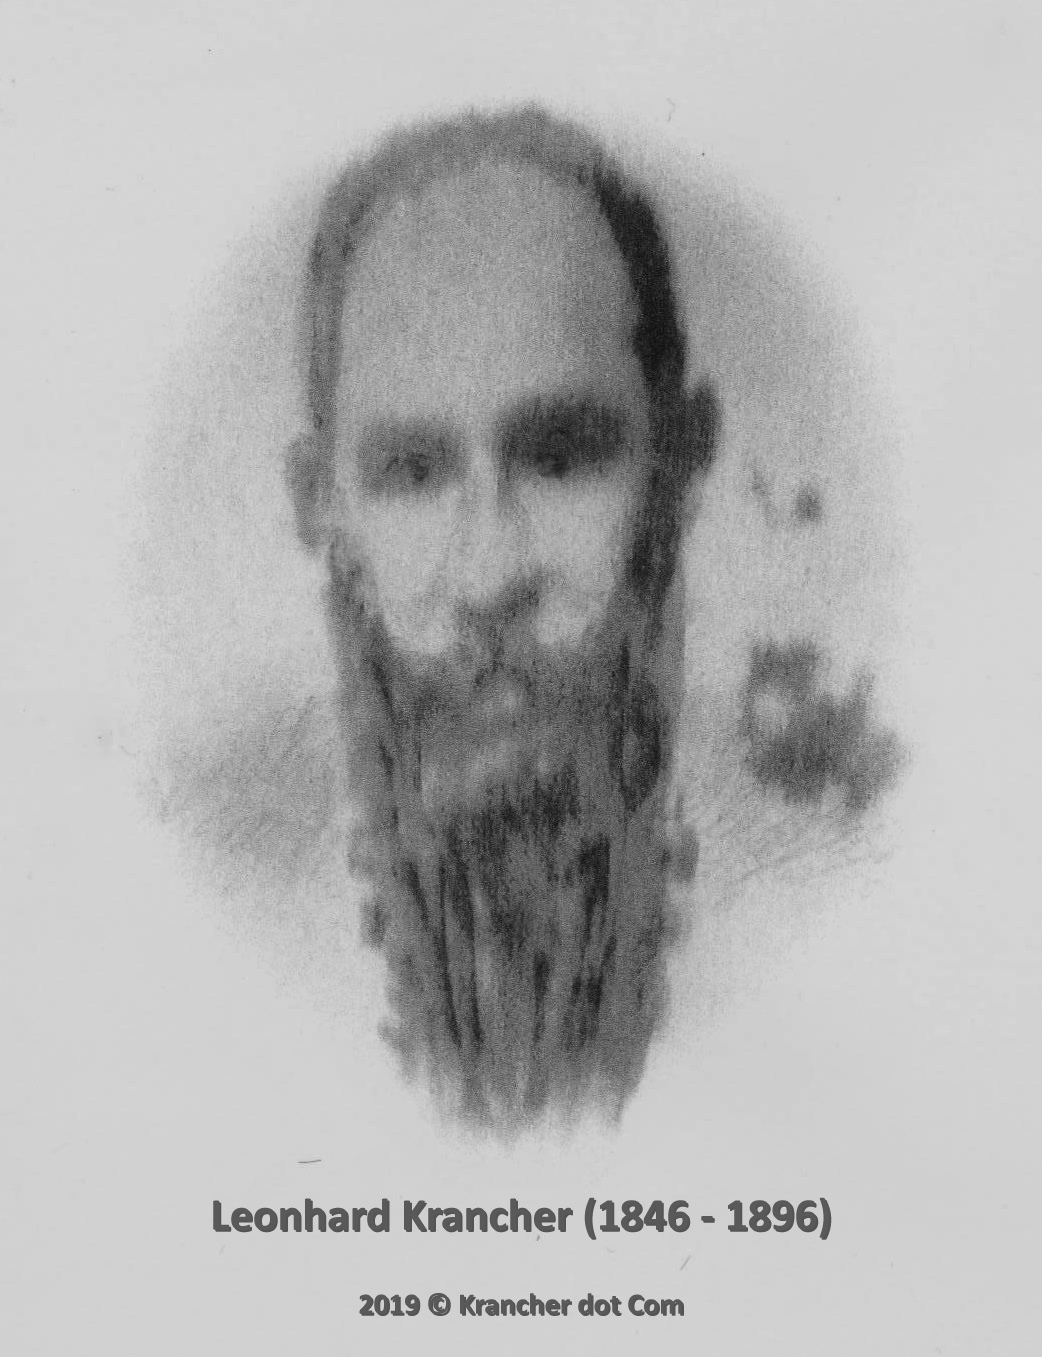 Leonhard Krancher